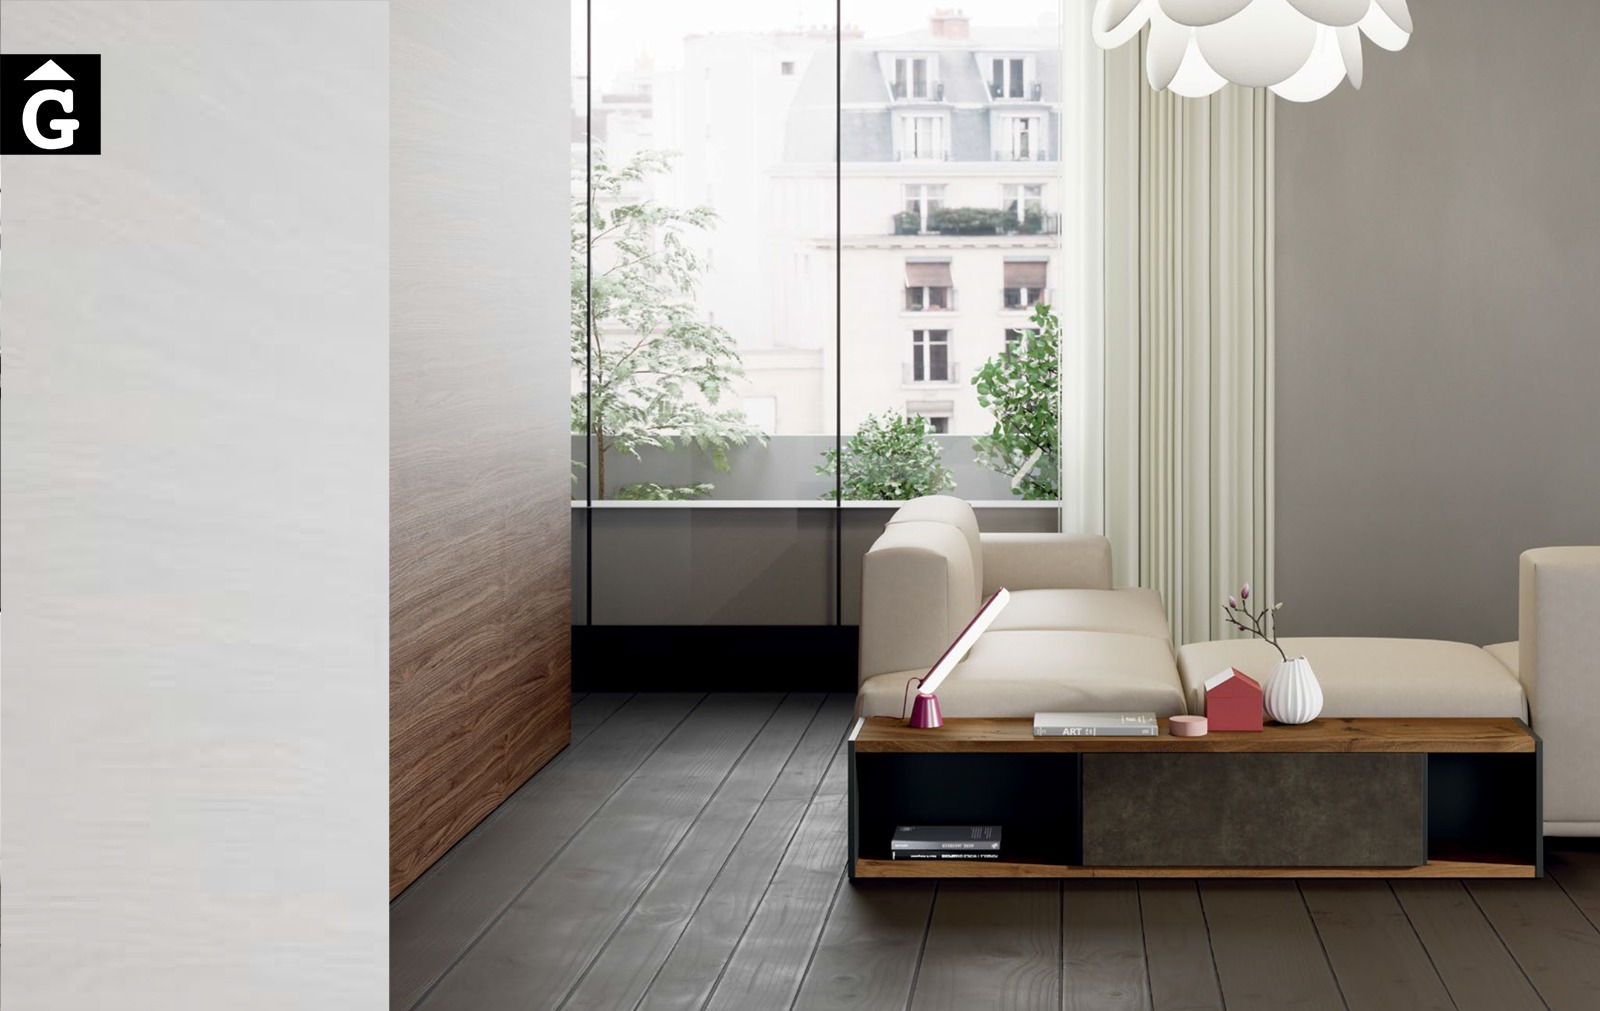 Line moble sofà ViVe muebles Verge programa llibrera llibreries living by mobles Gifreu